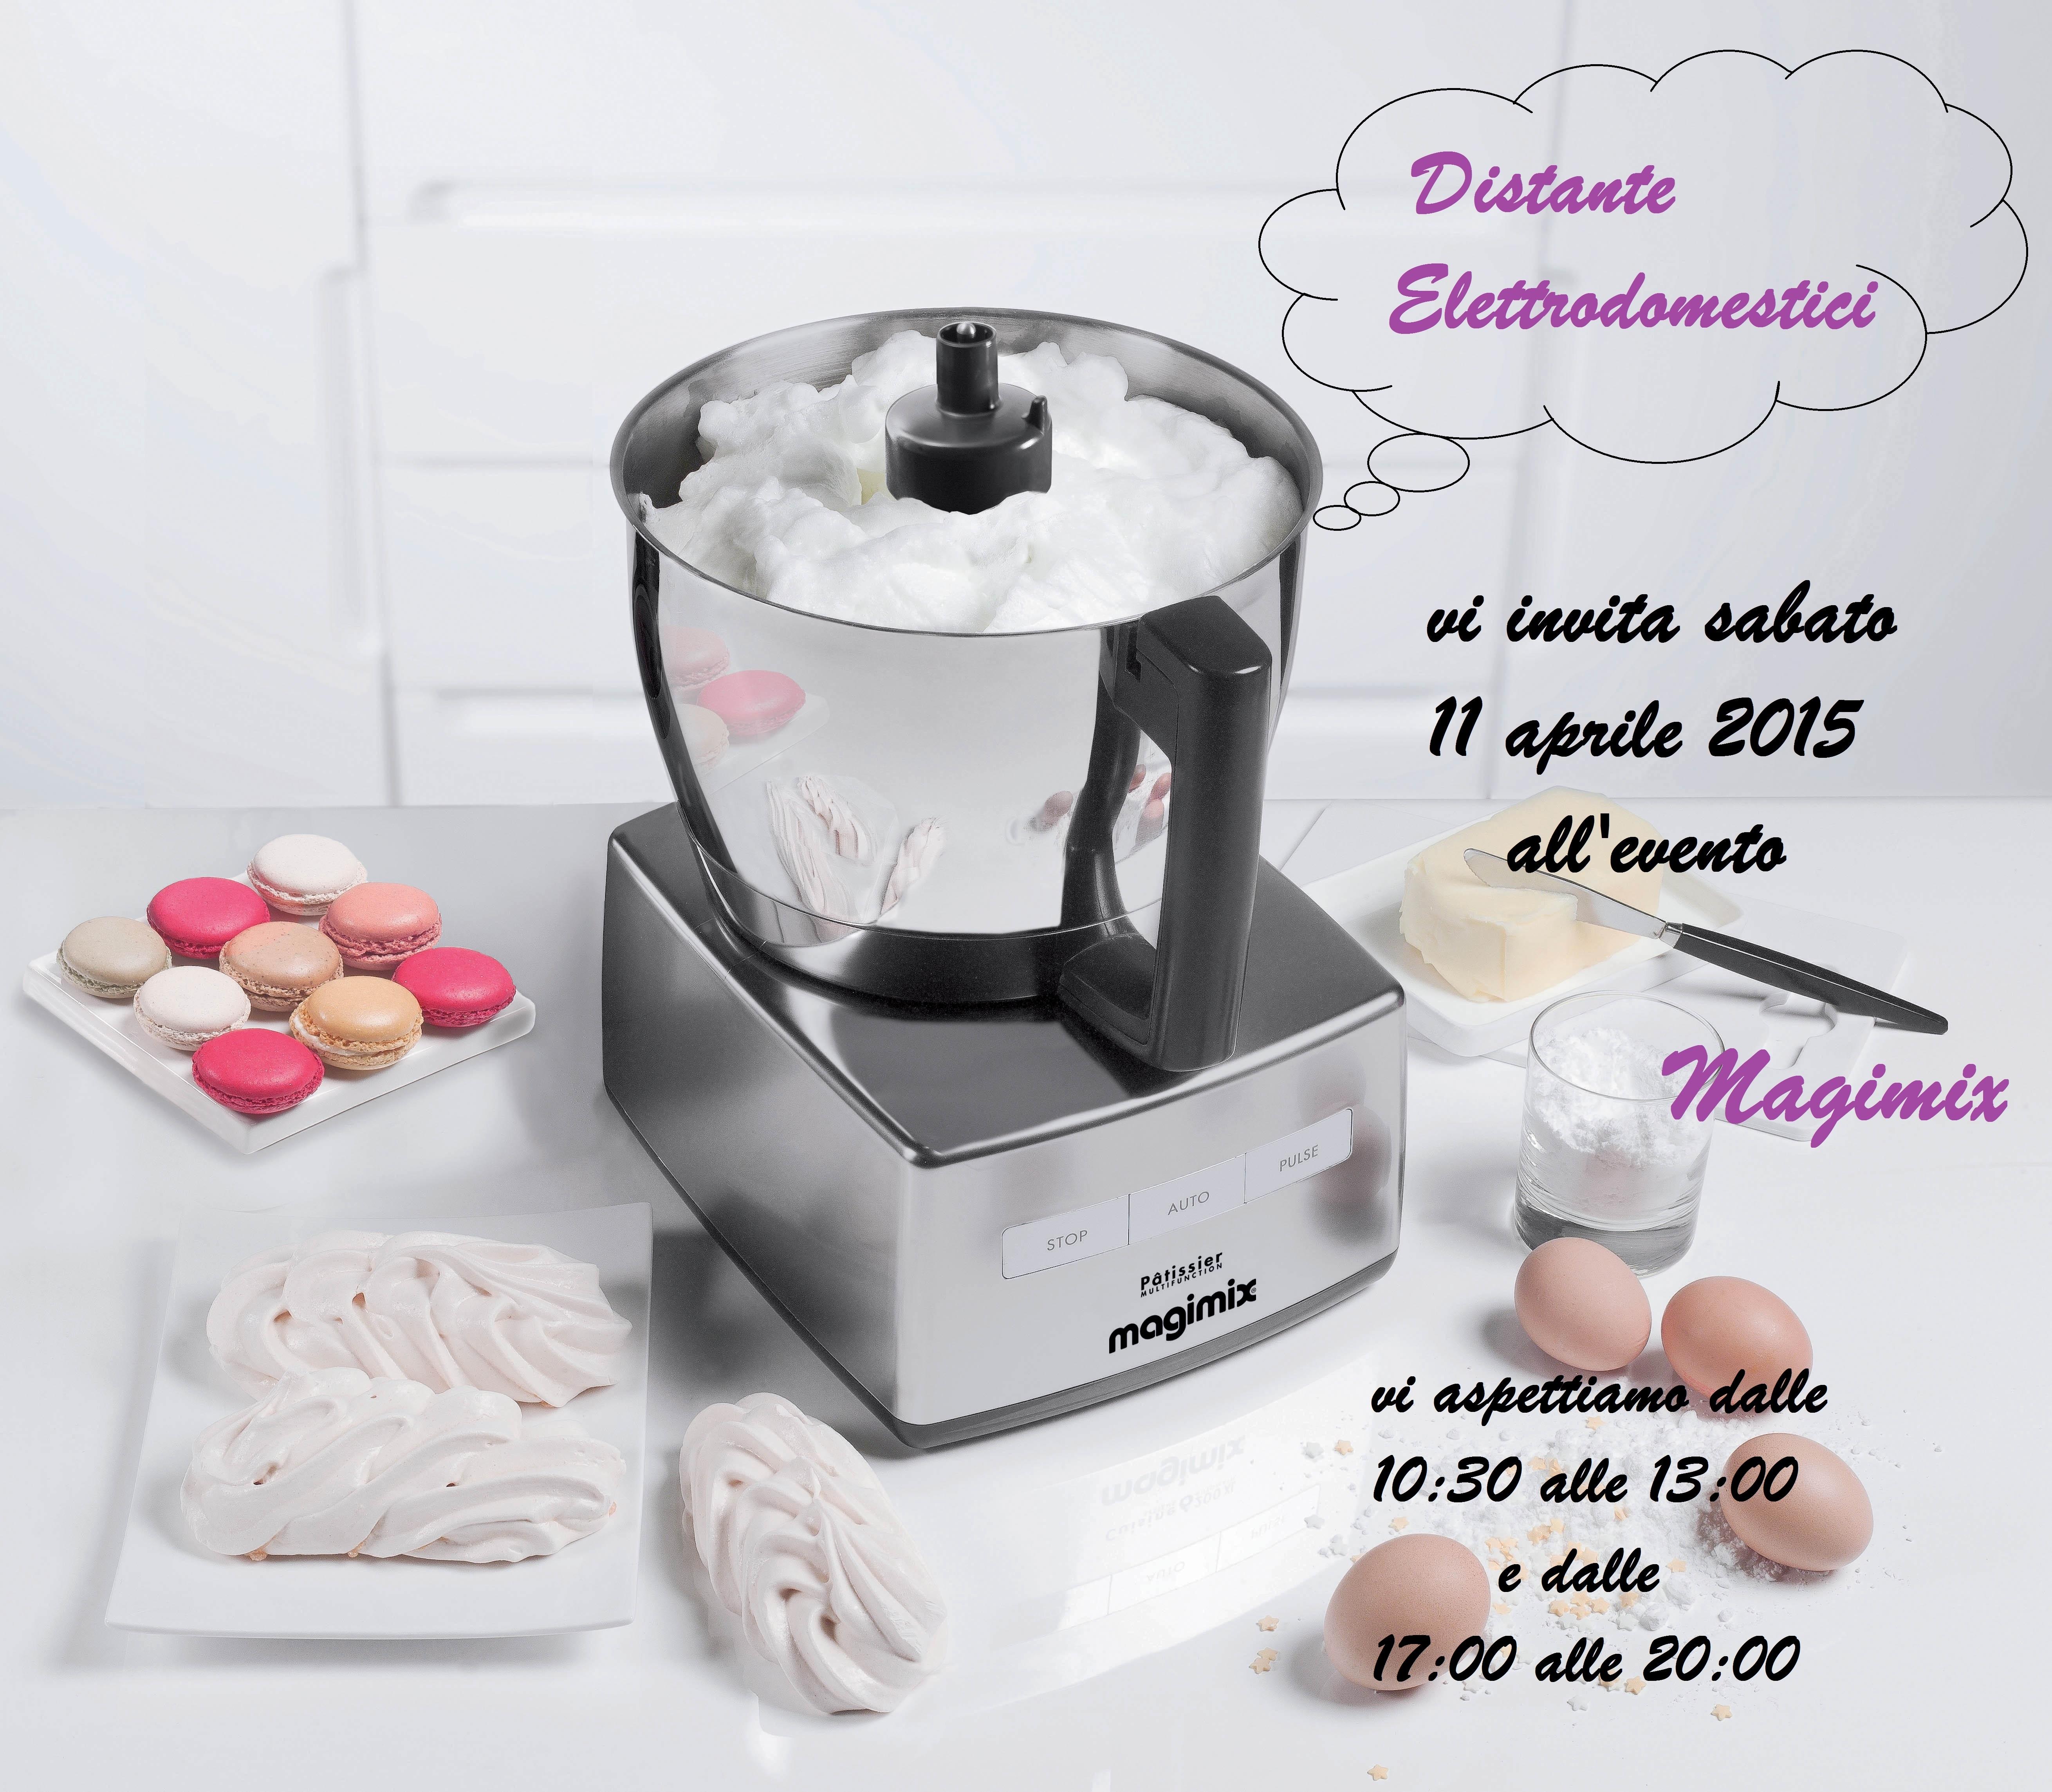 Evento magimix un aiuto in cucina - Aiuto in cucina ...